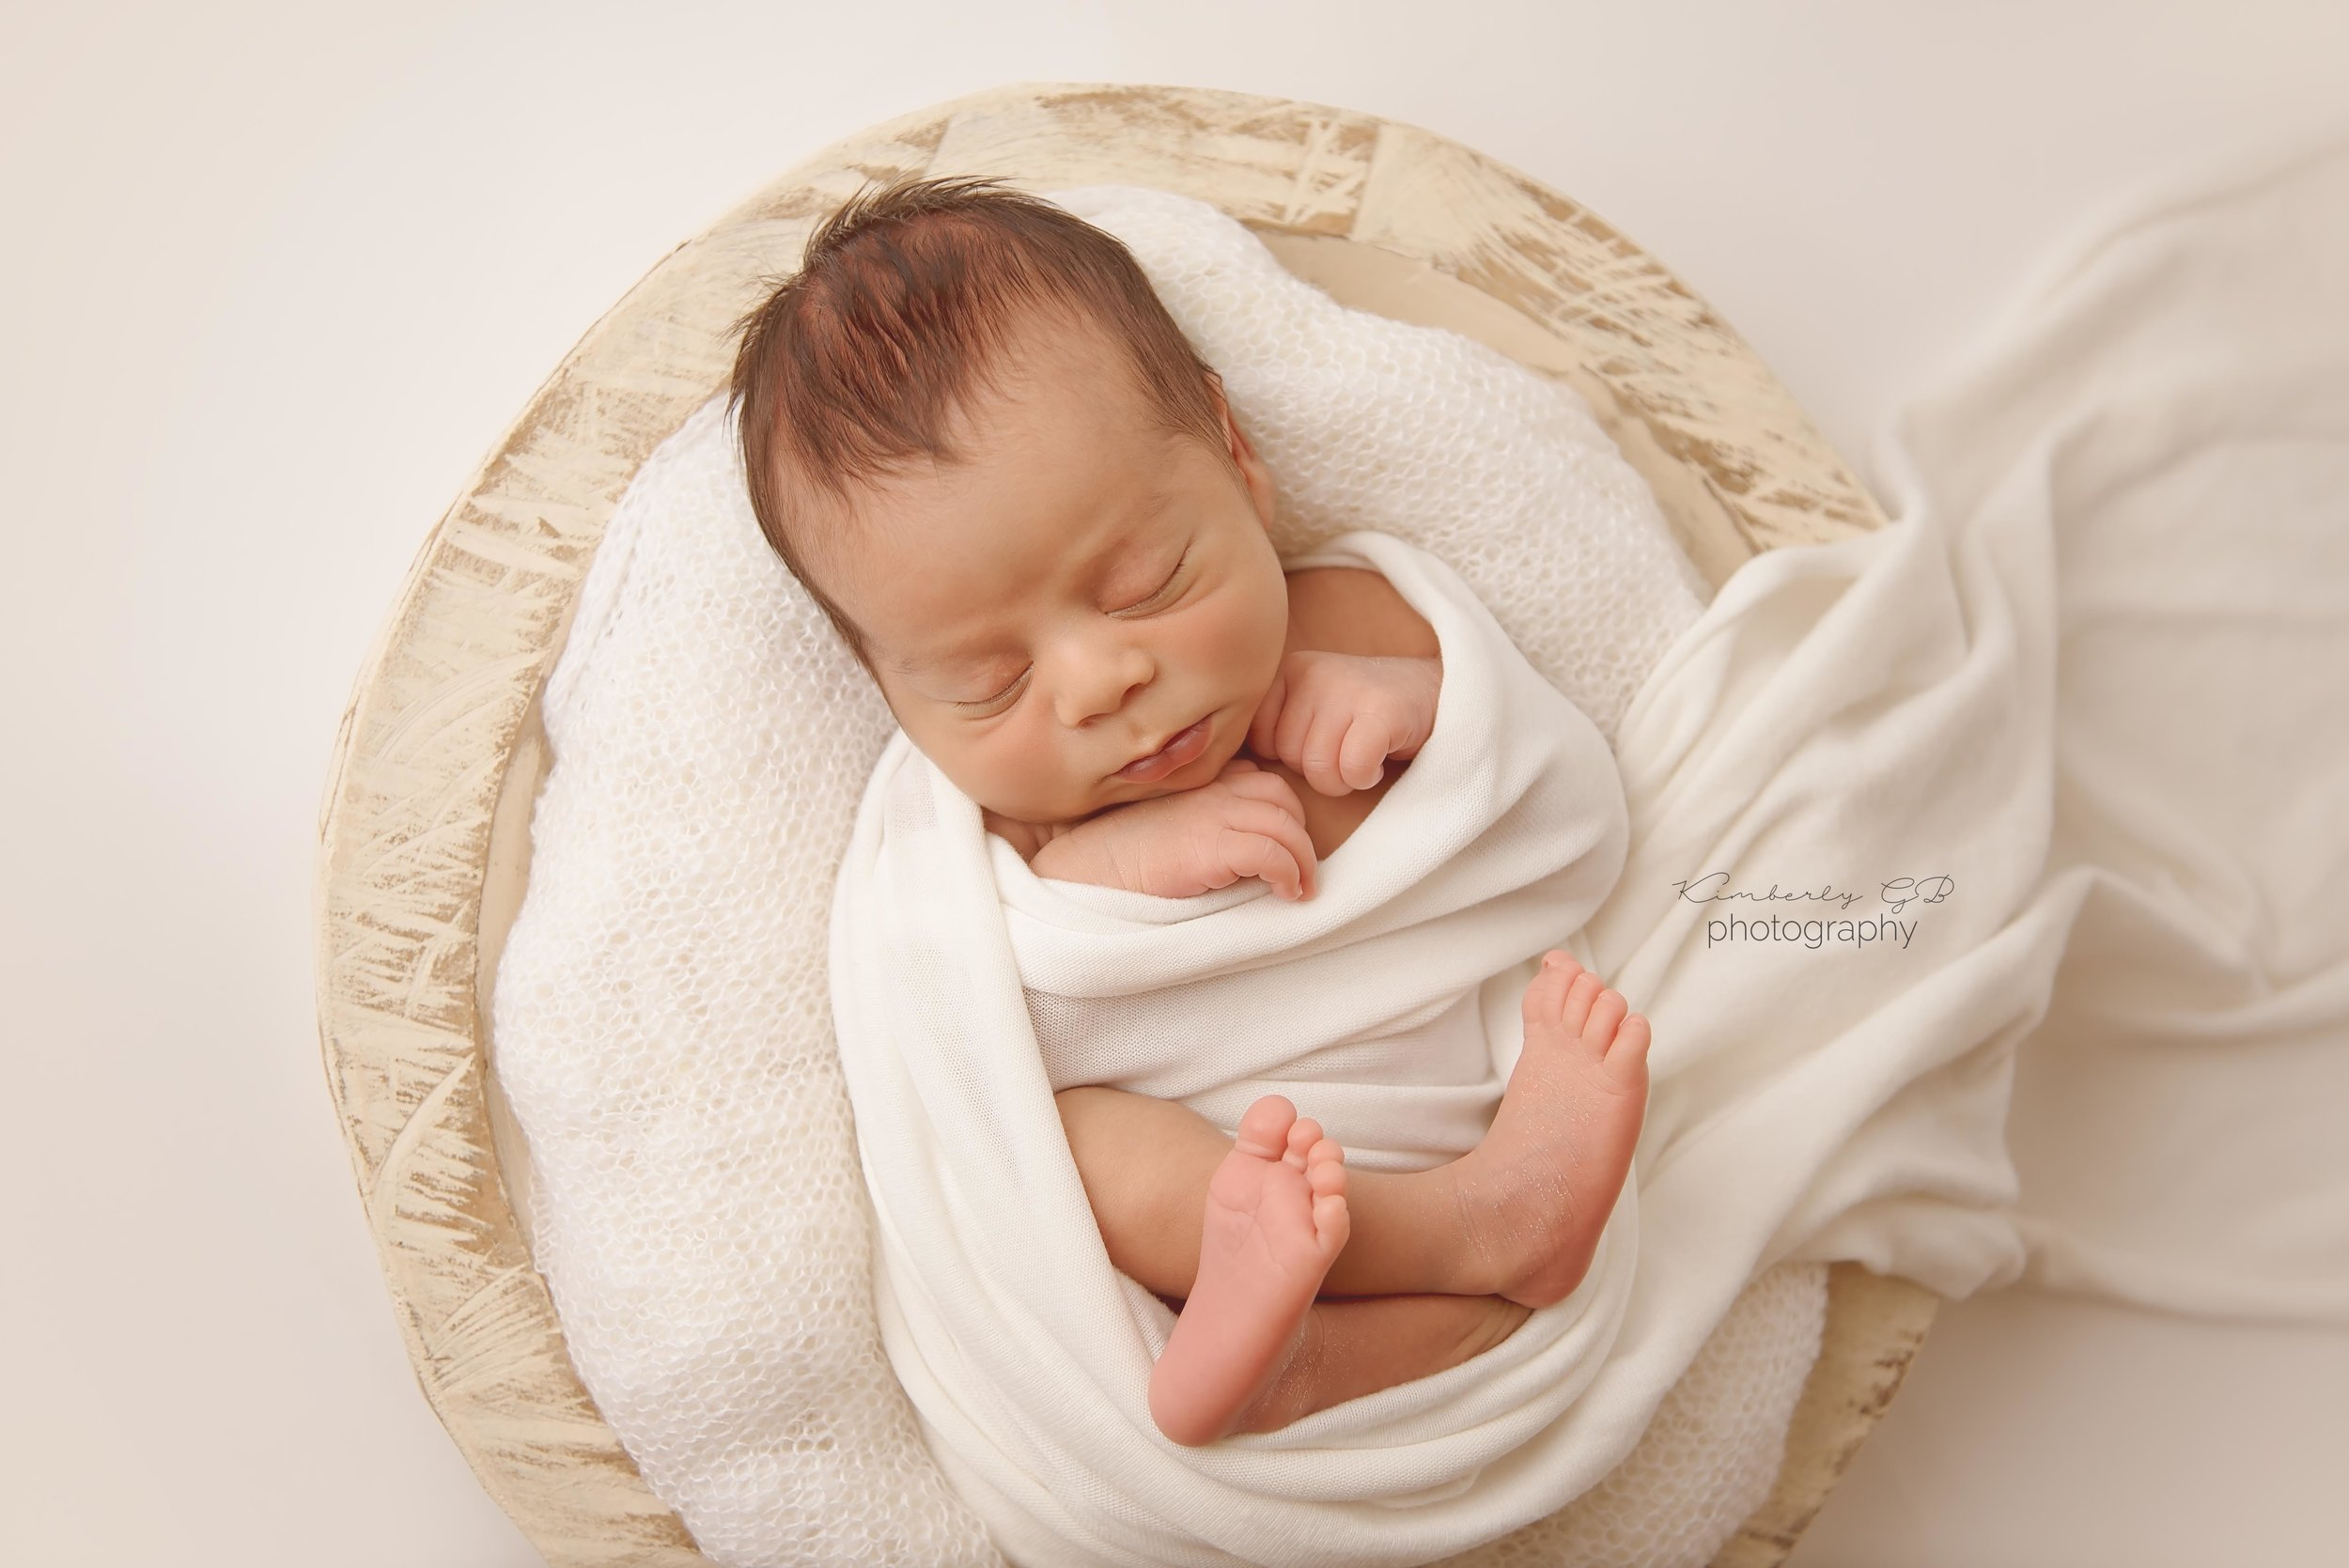 fotografia-de-recien-nacidos-bebes-newborn-en-puerto-rico-kimberly-gb-photography-fotografa-146.jpg